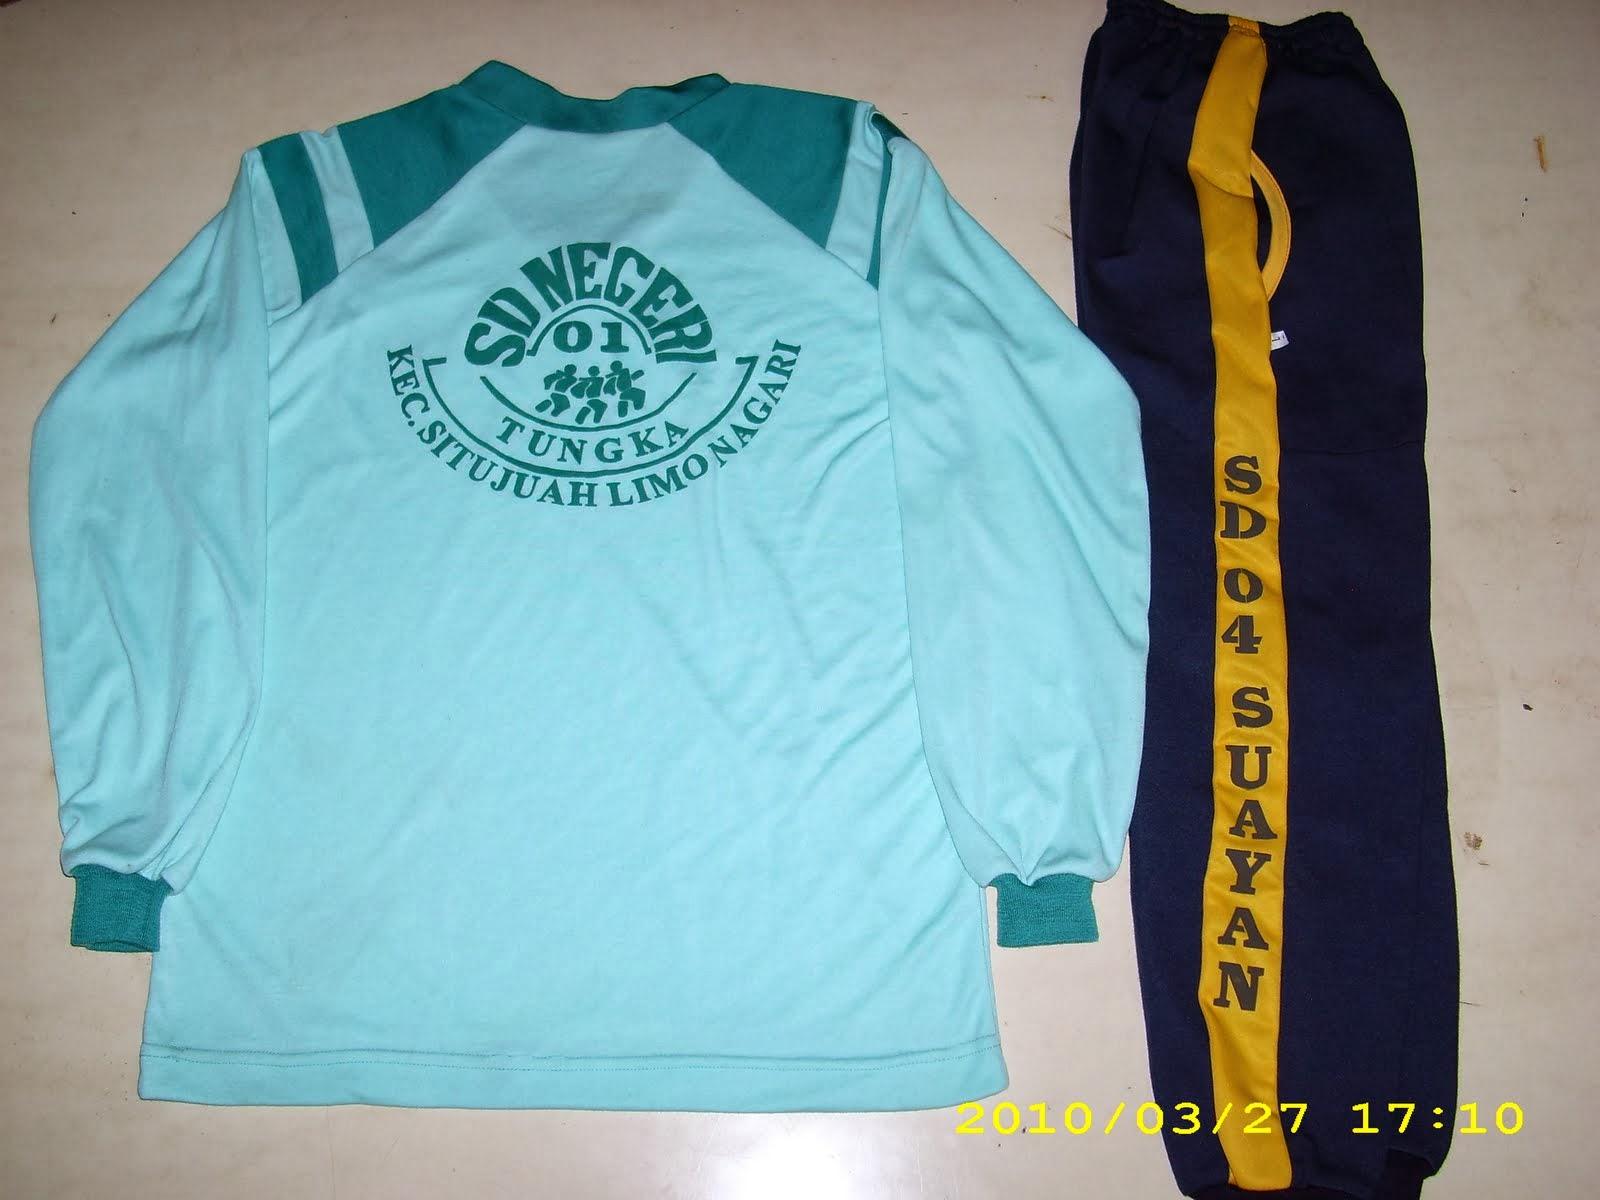 tawazun konveksi: Dapat Order 70stel Kaos Olahraga SD